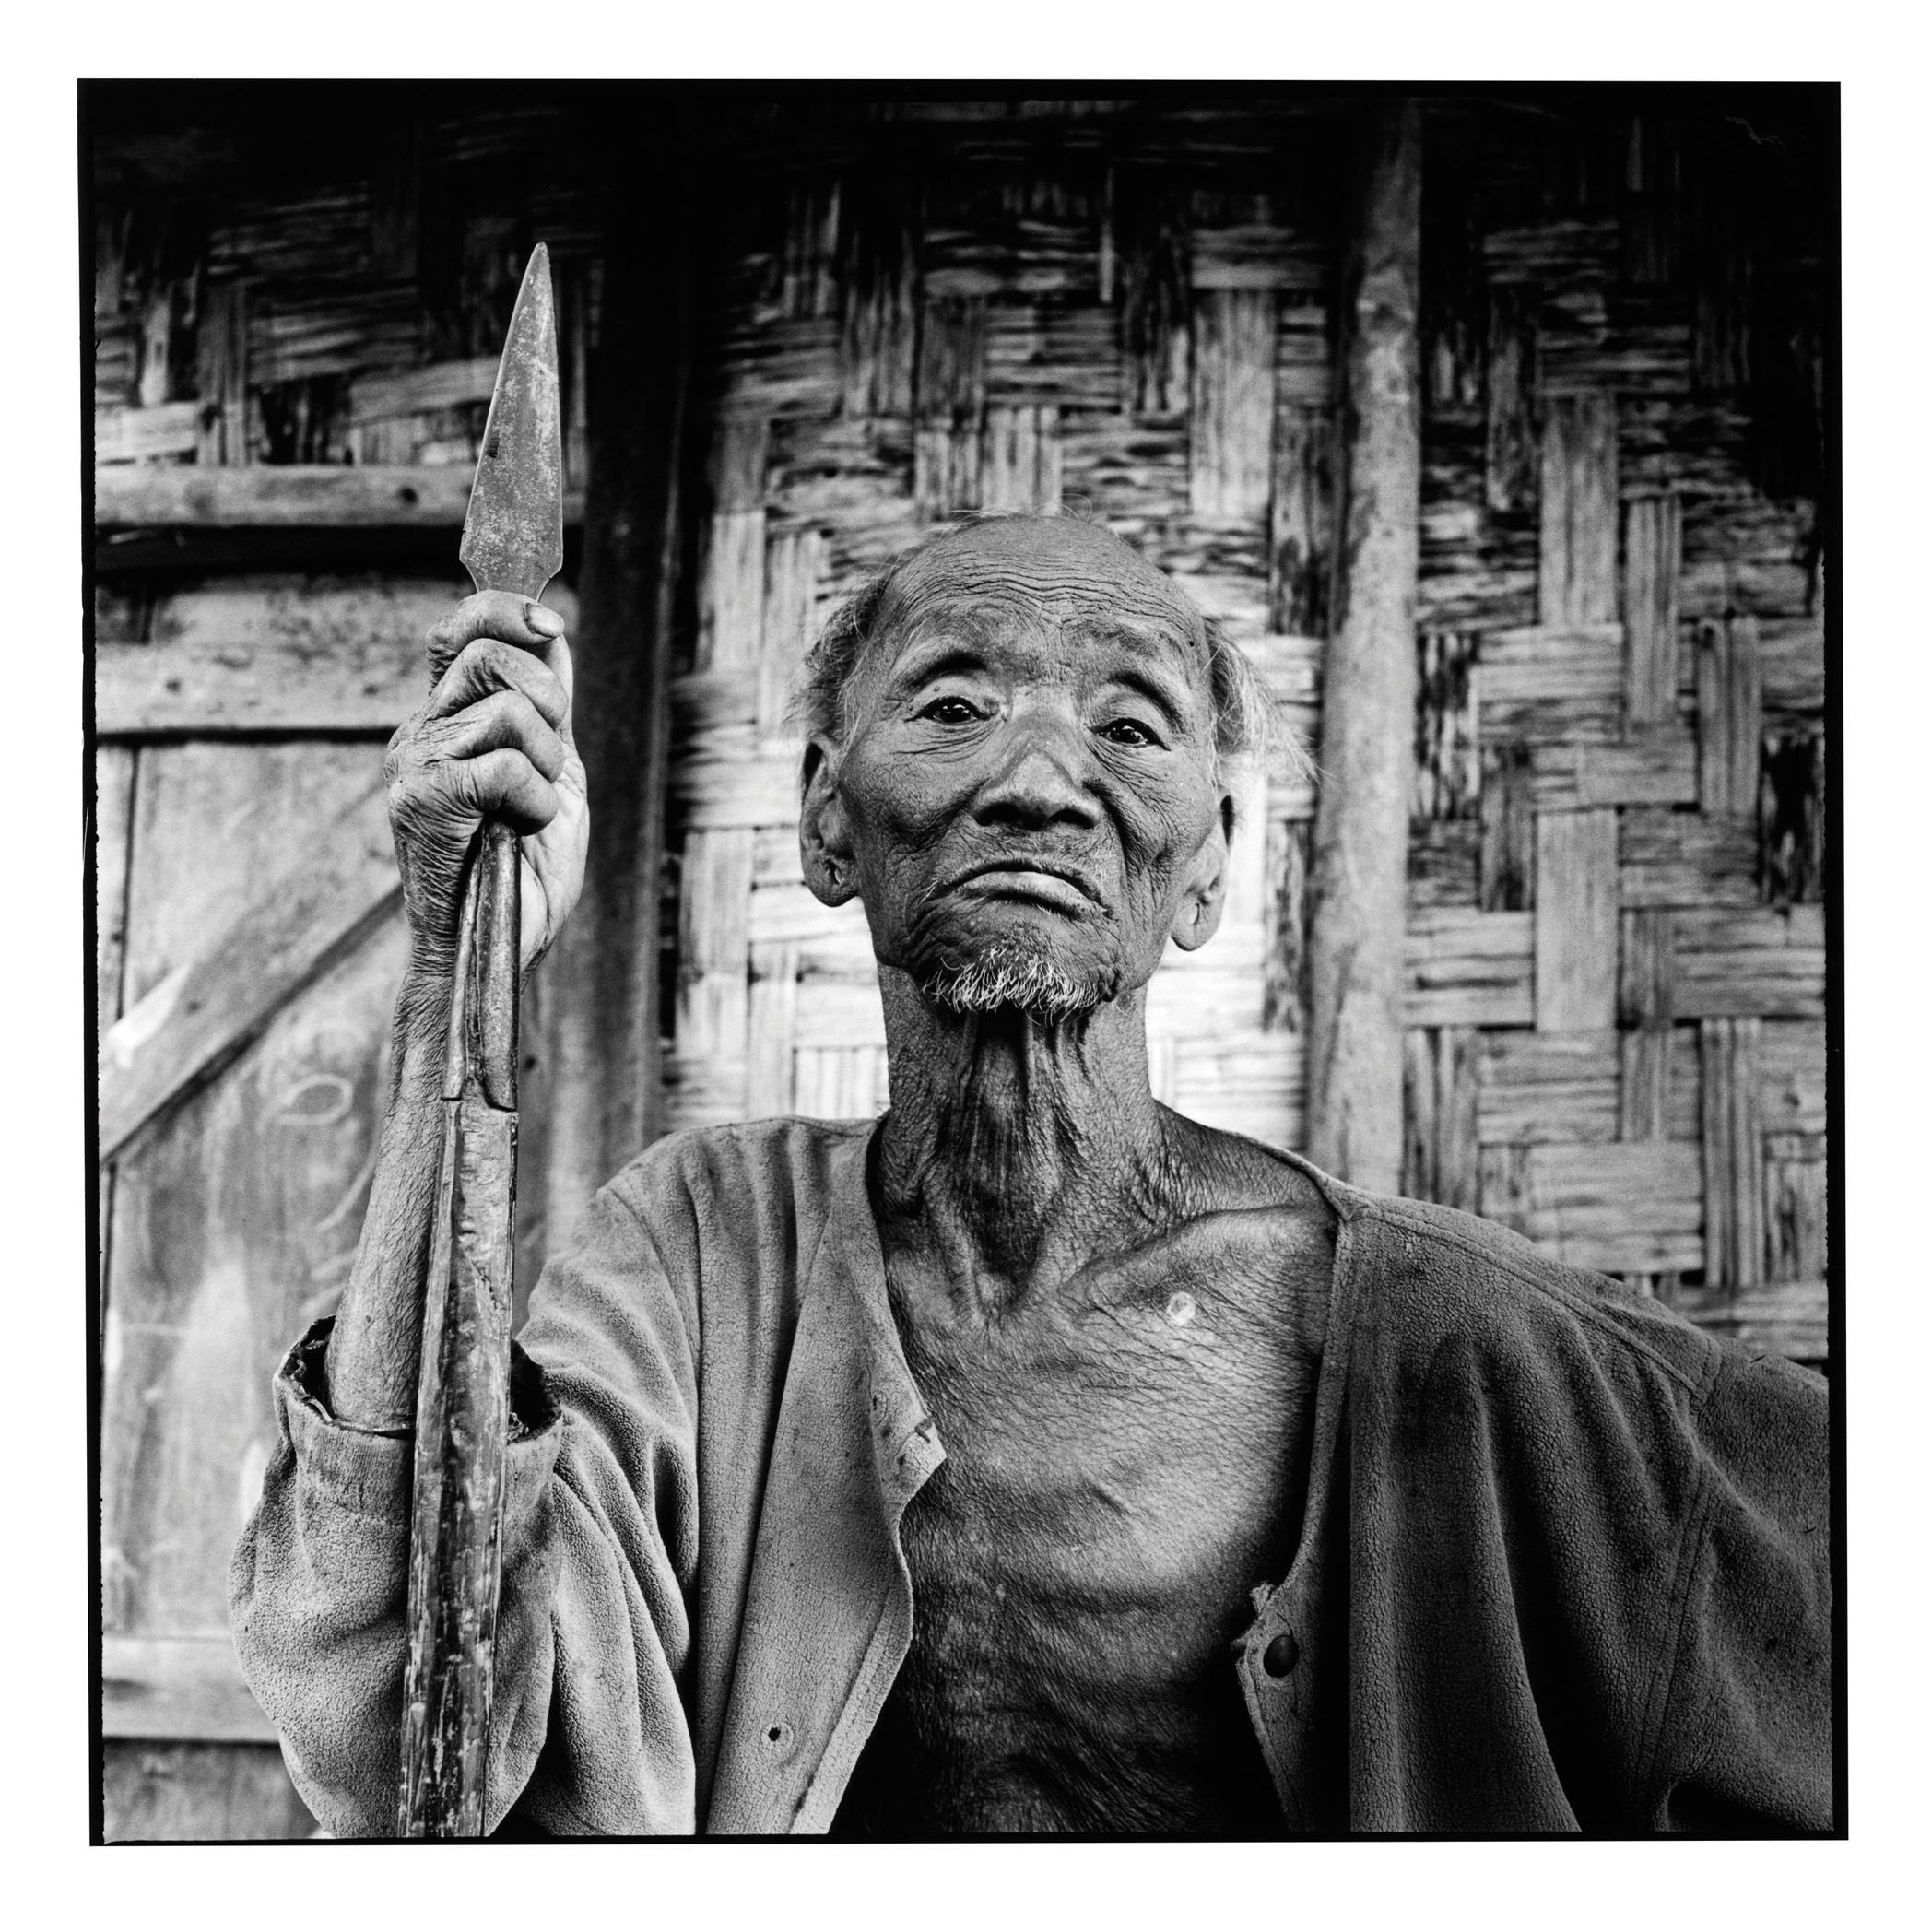 David Bailey - From the series Nagaland by David Bailey, 2012 © David Bailey/ Image courtesy NPG